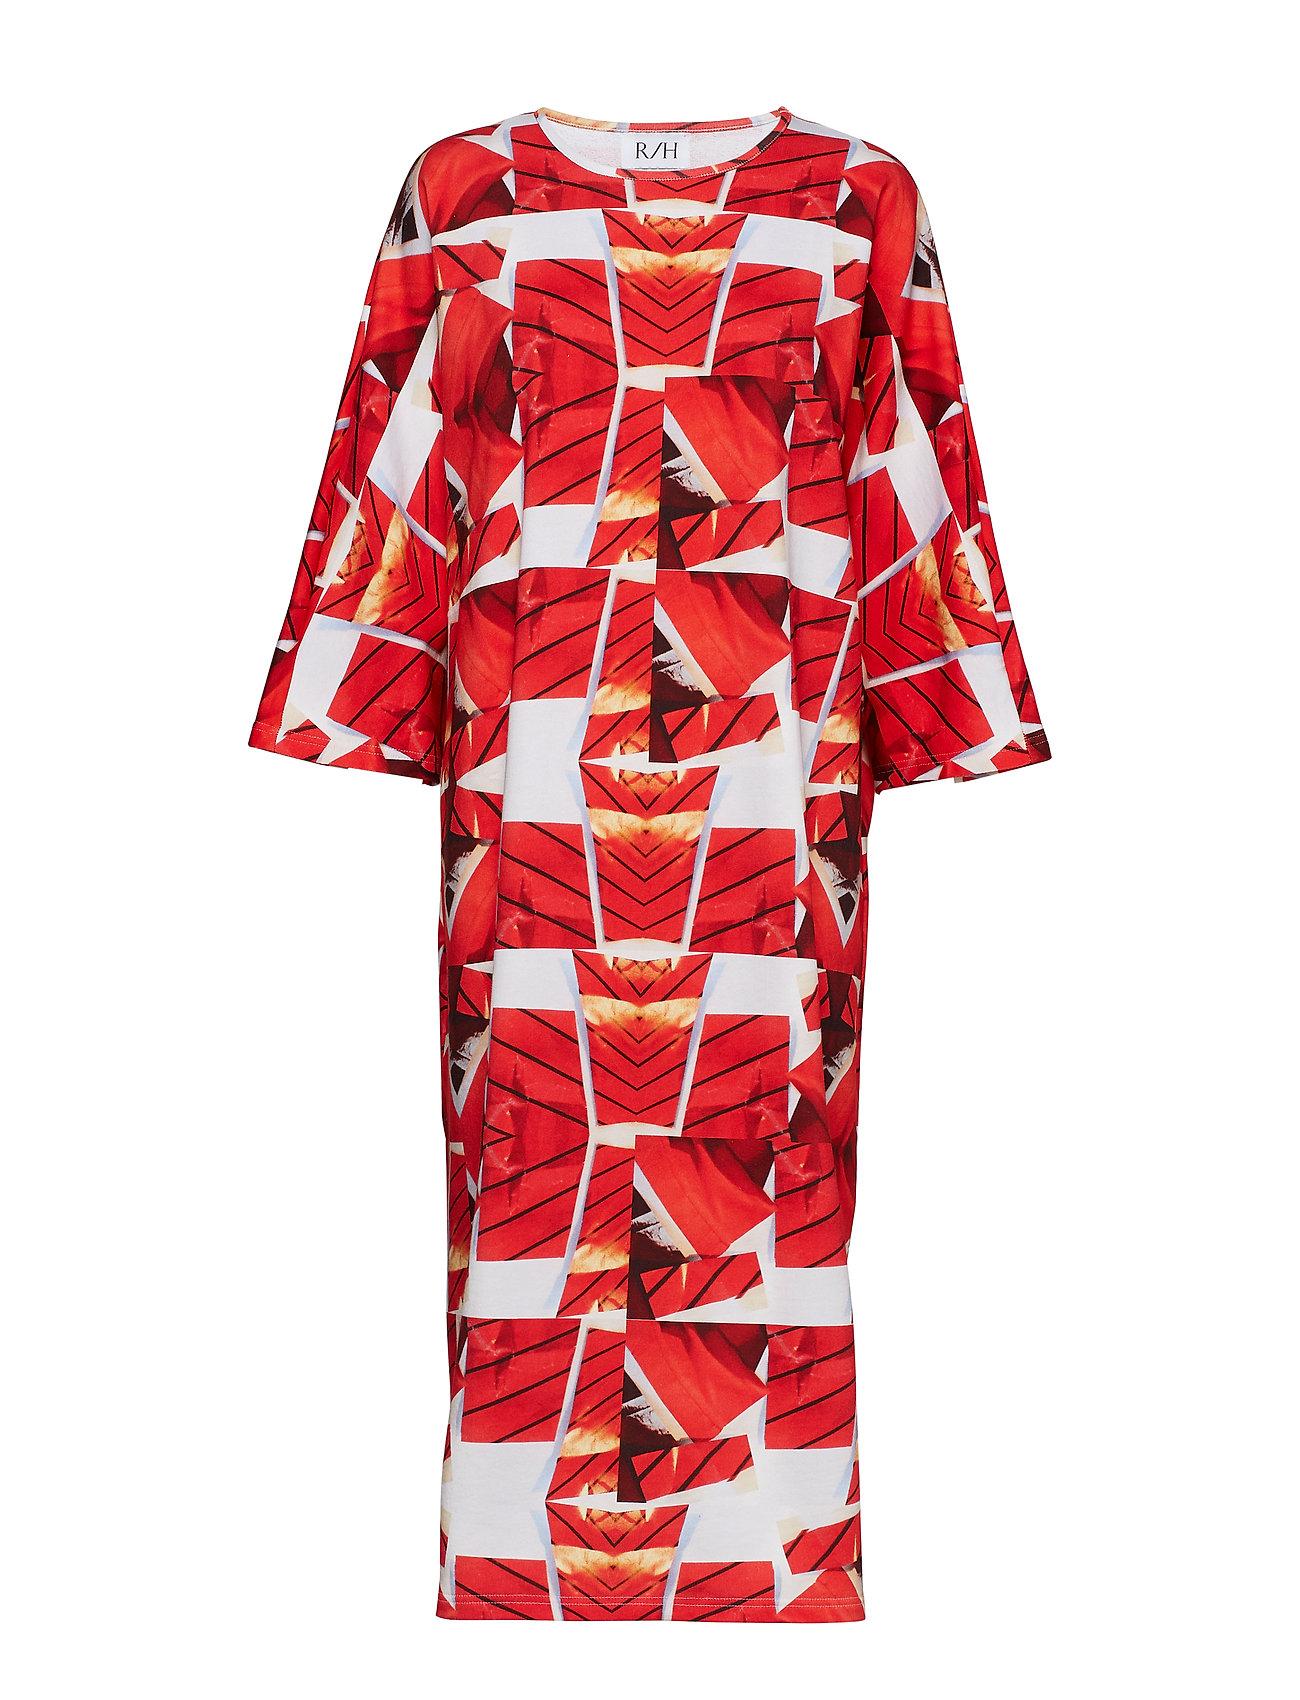 R/H Studio Mumba Dress - ROOF PRINT